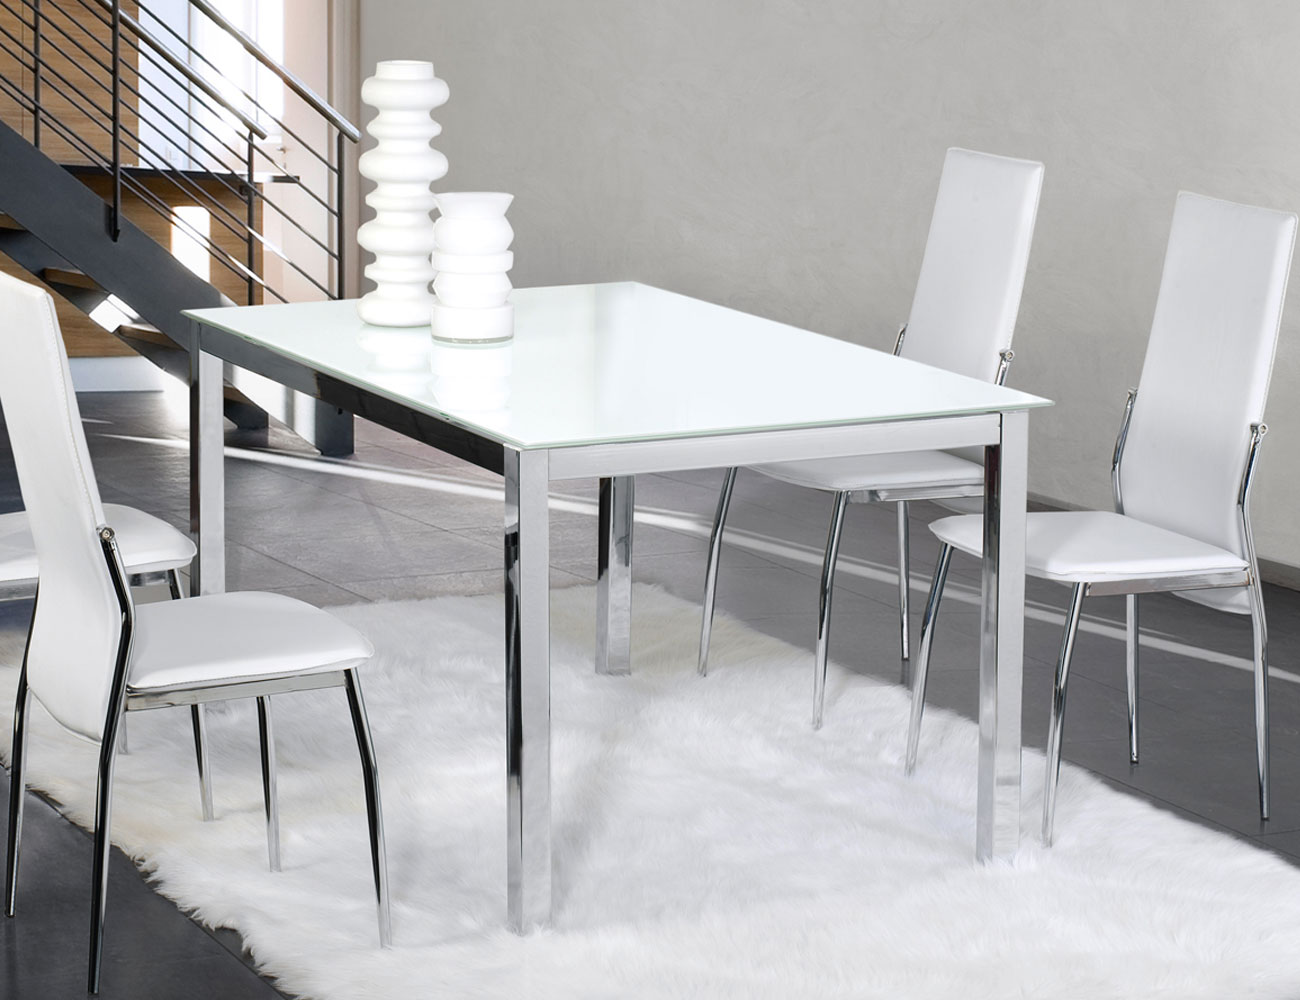 Mesa comedor cristal templado cromada 201 blanca 3092